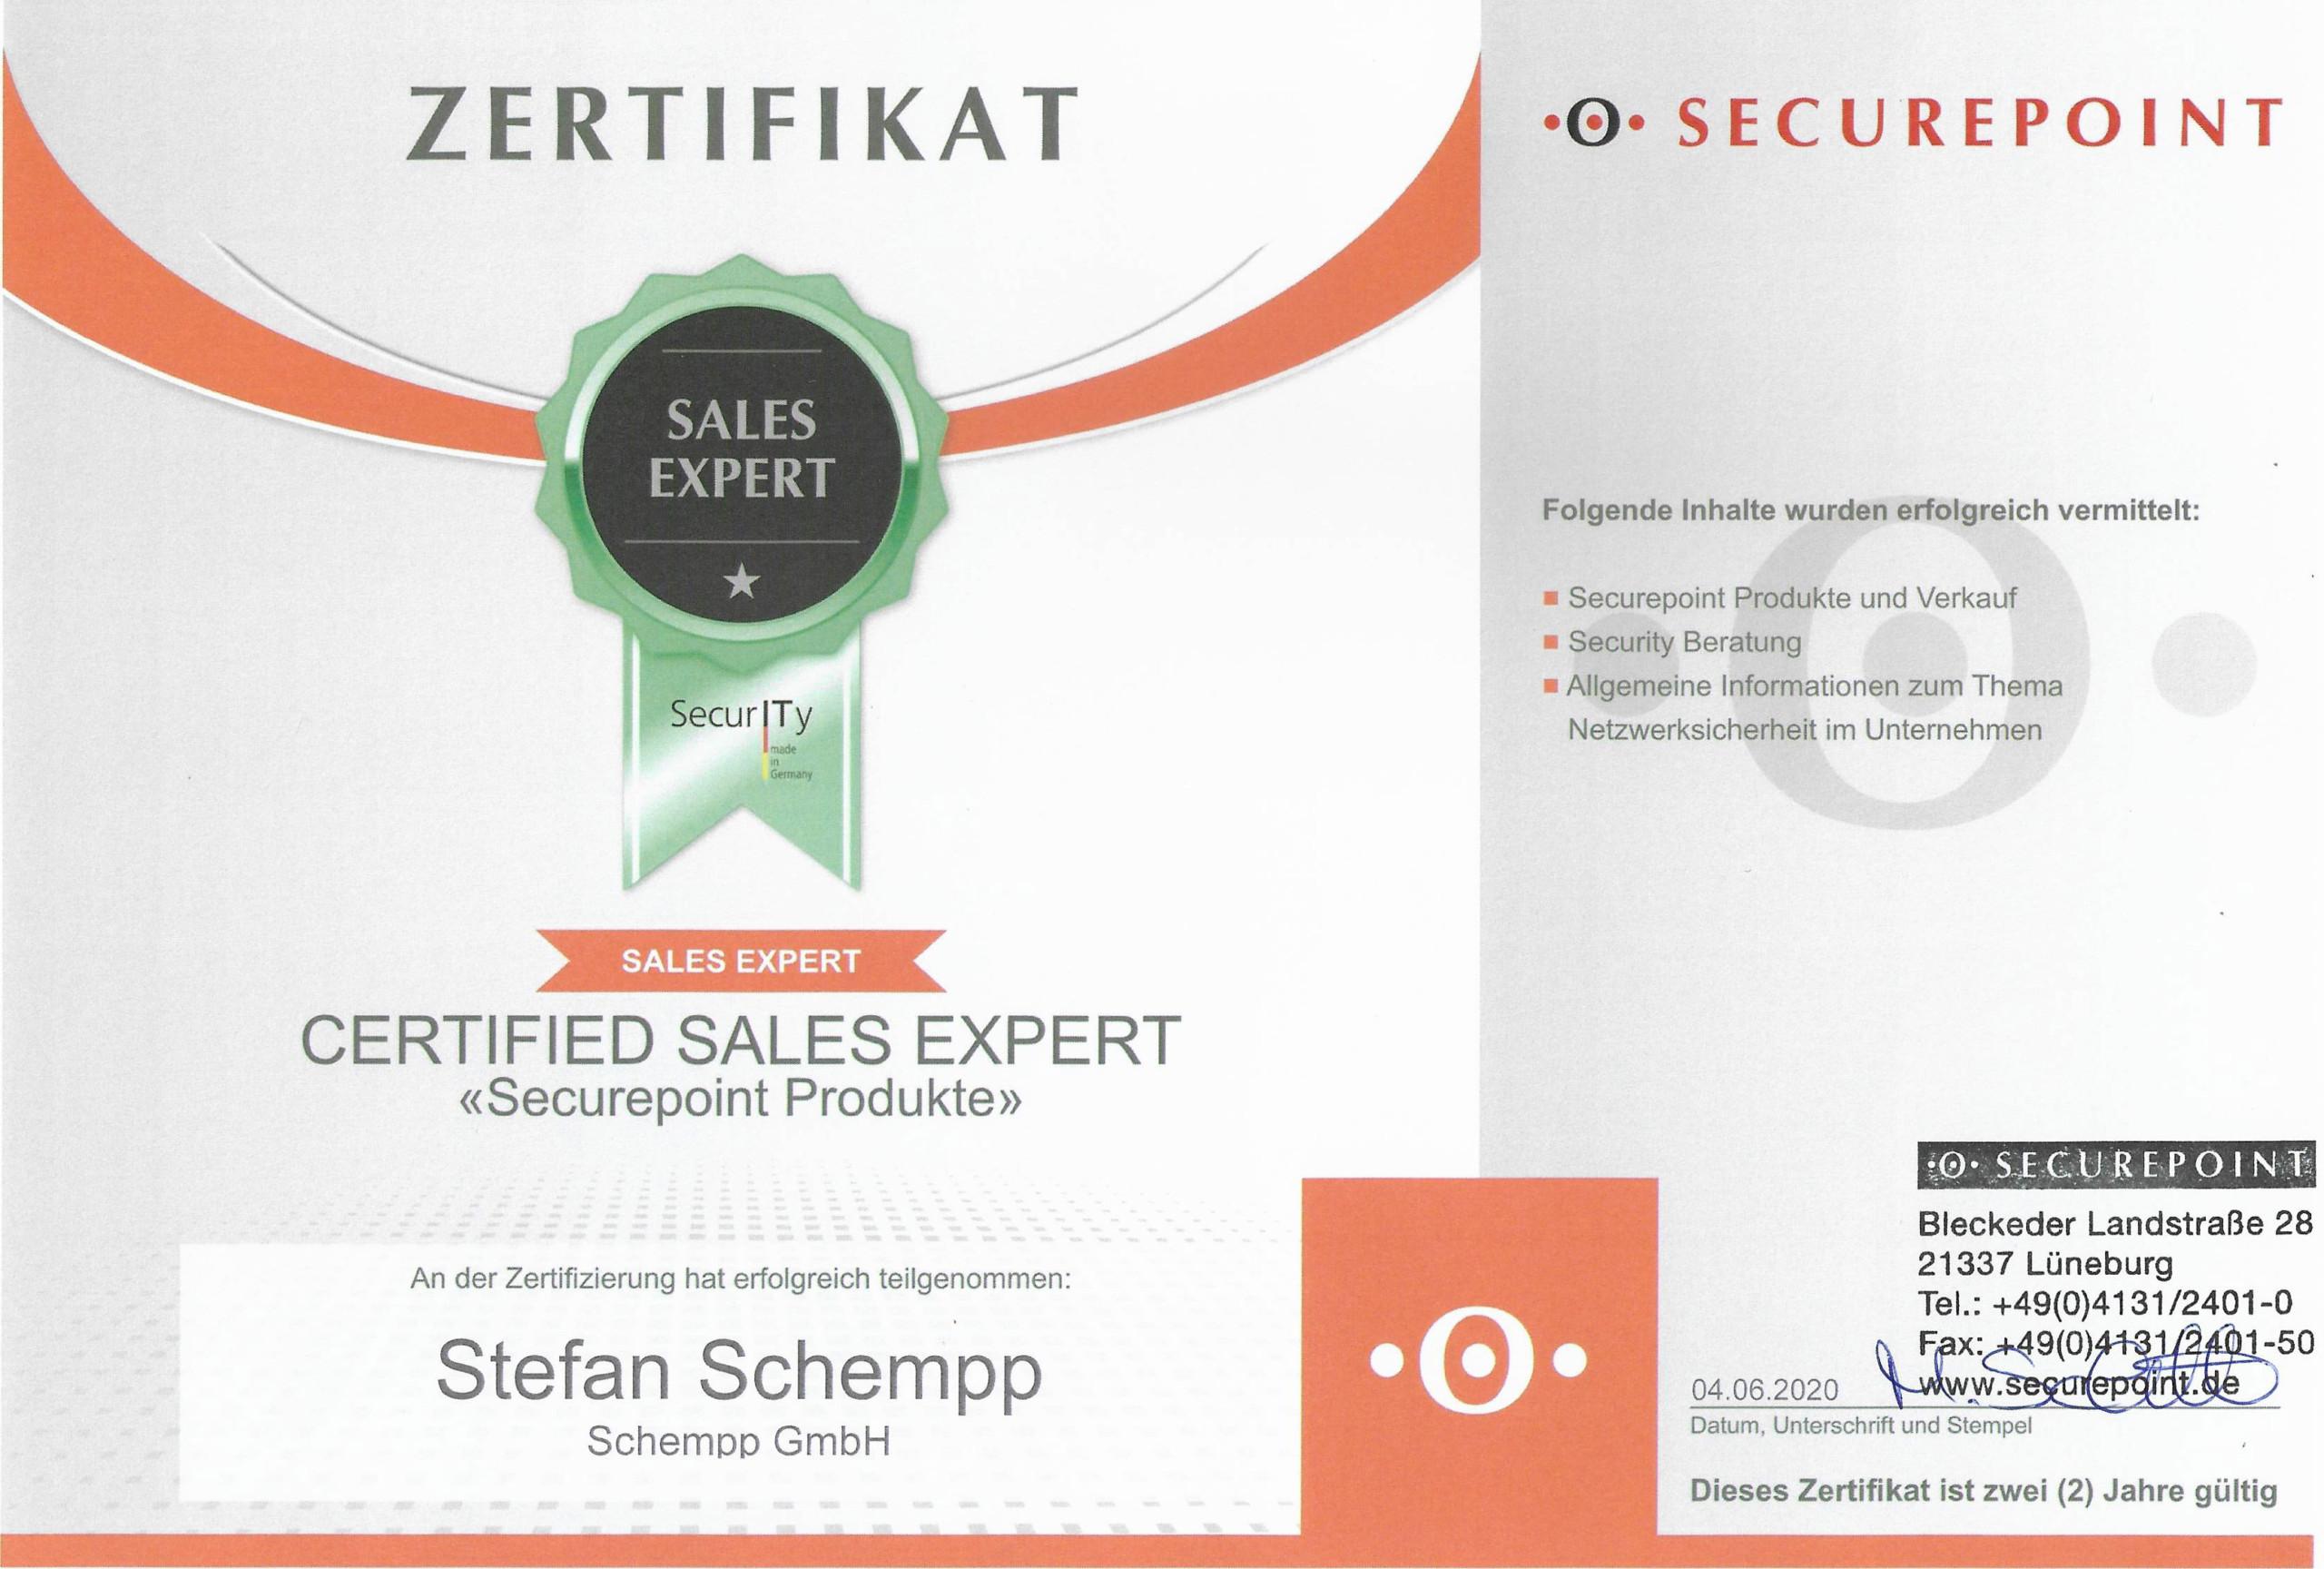 Securepoint Sales Expert Zertifikat